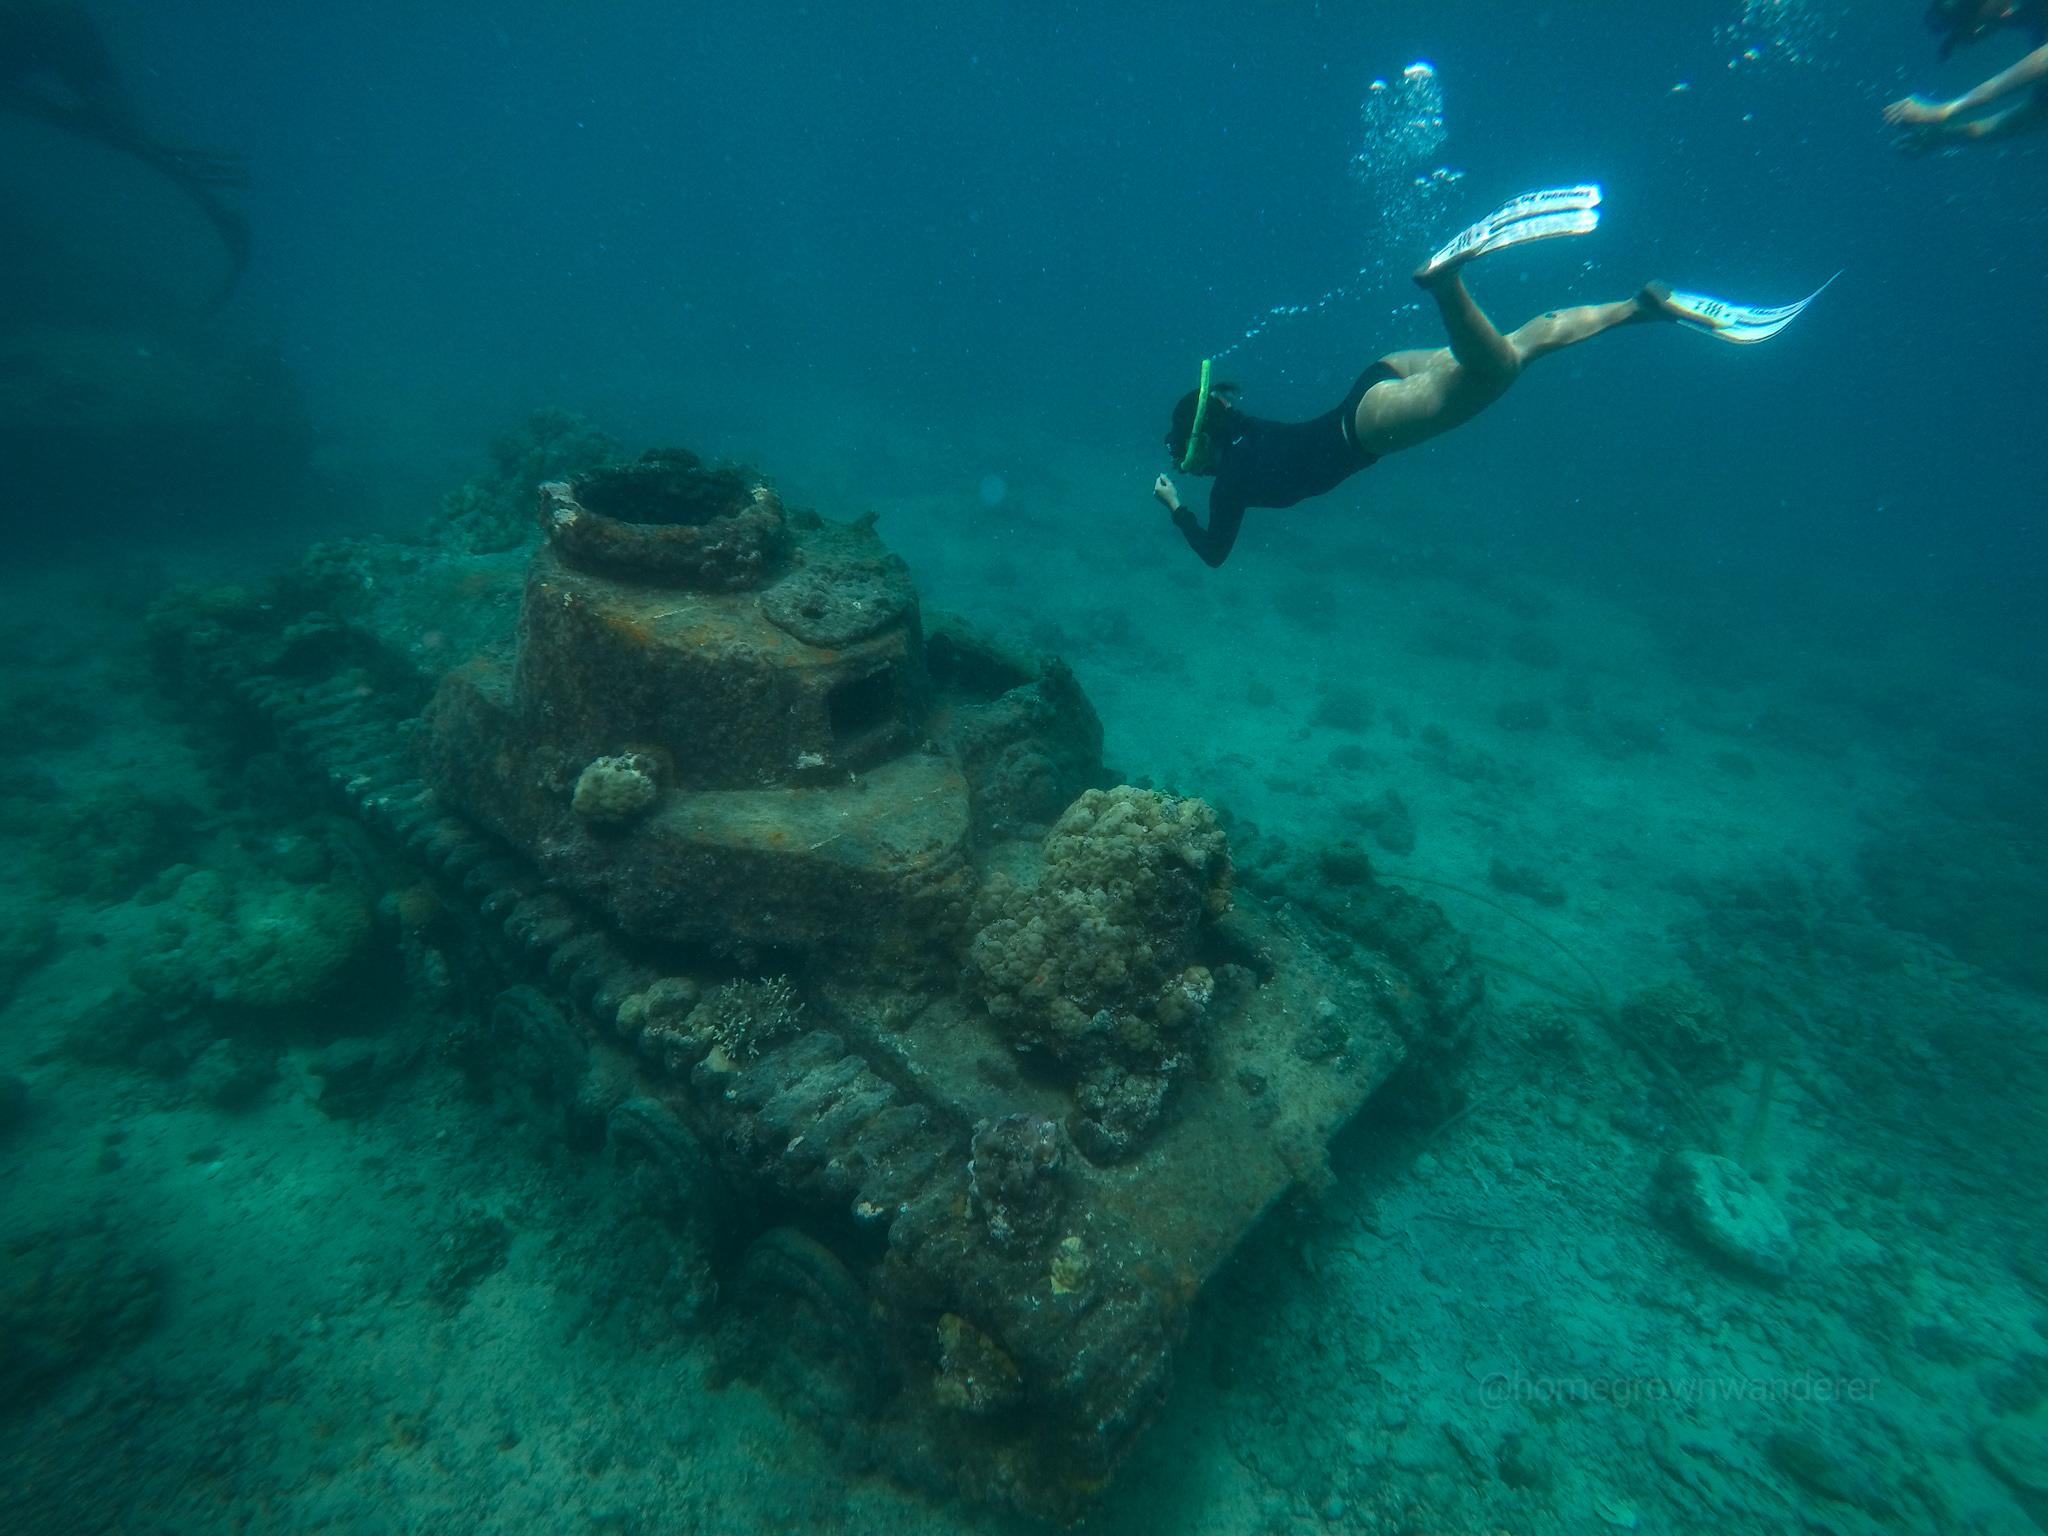 Japanese Tank - (C) Rabaul Dive Adventures